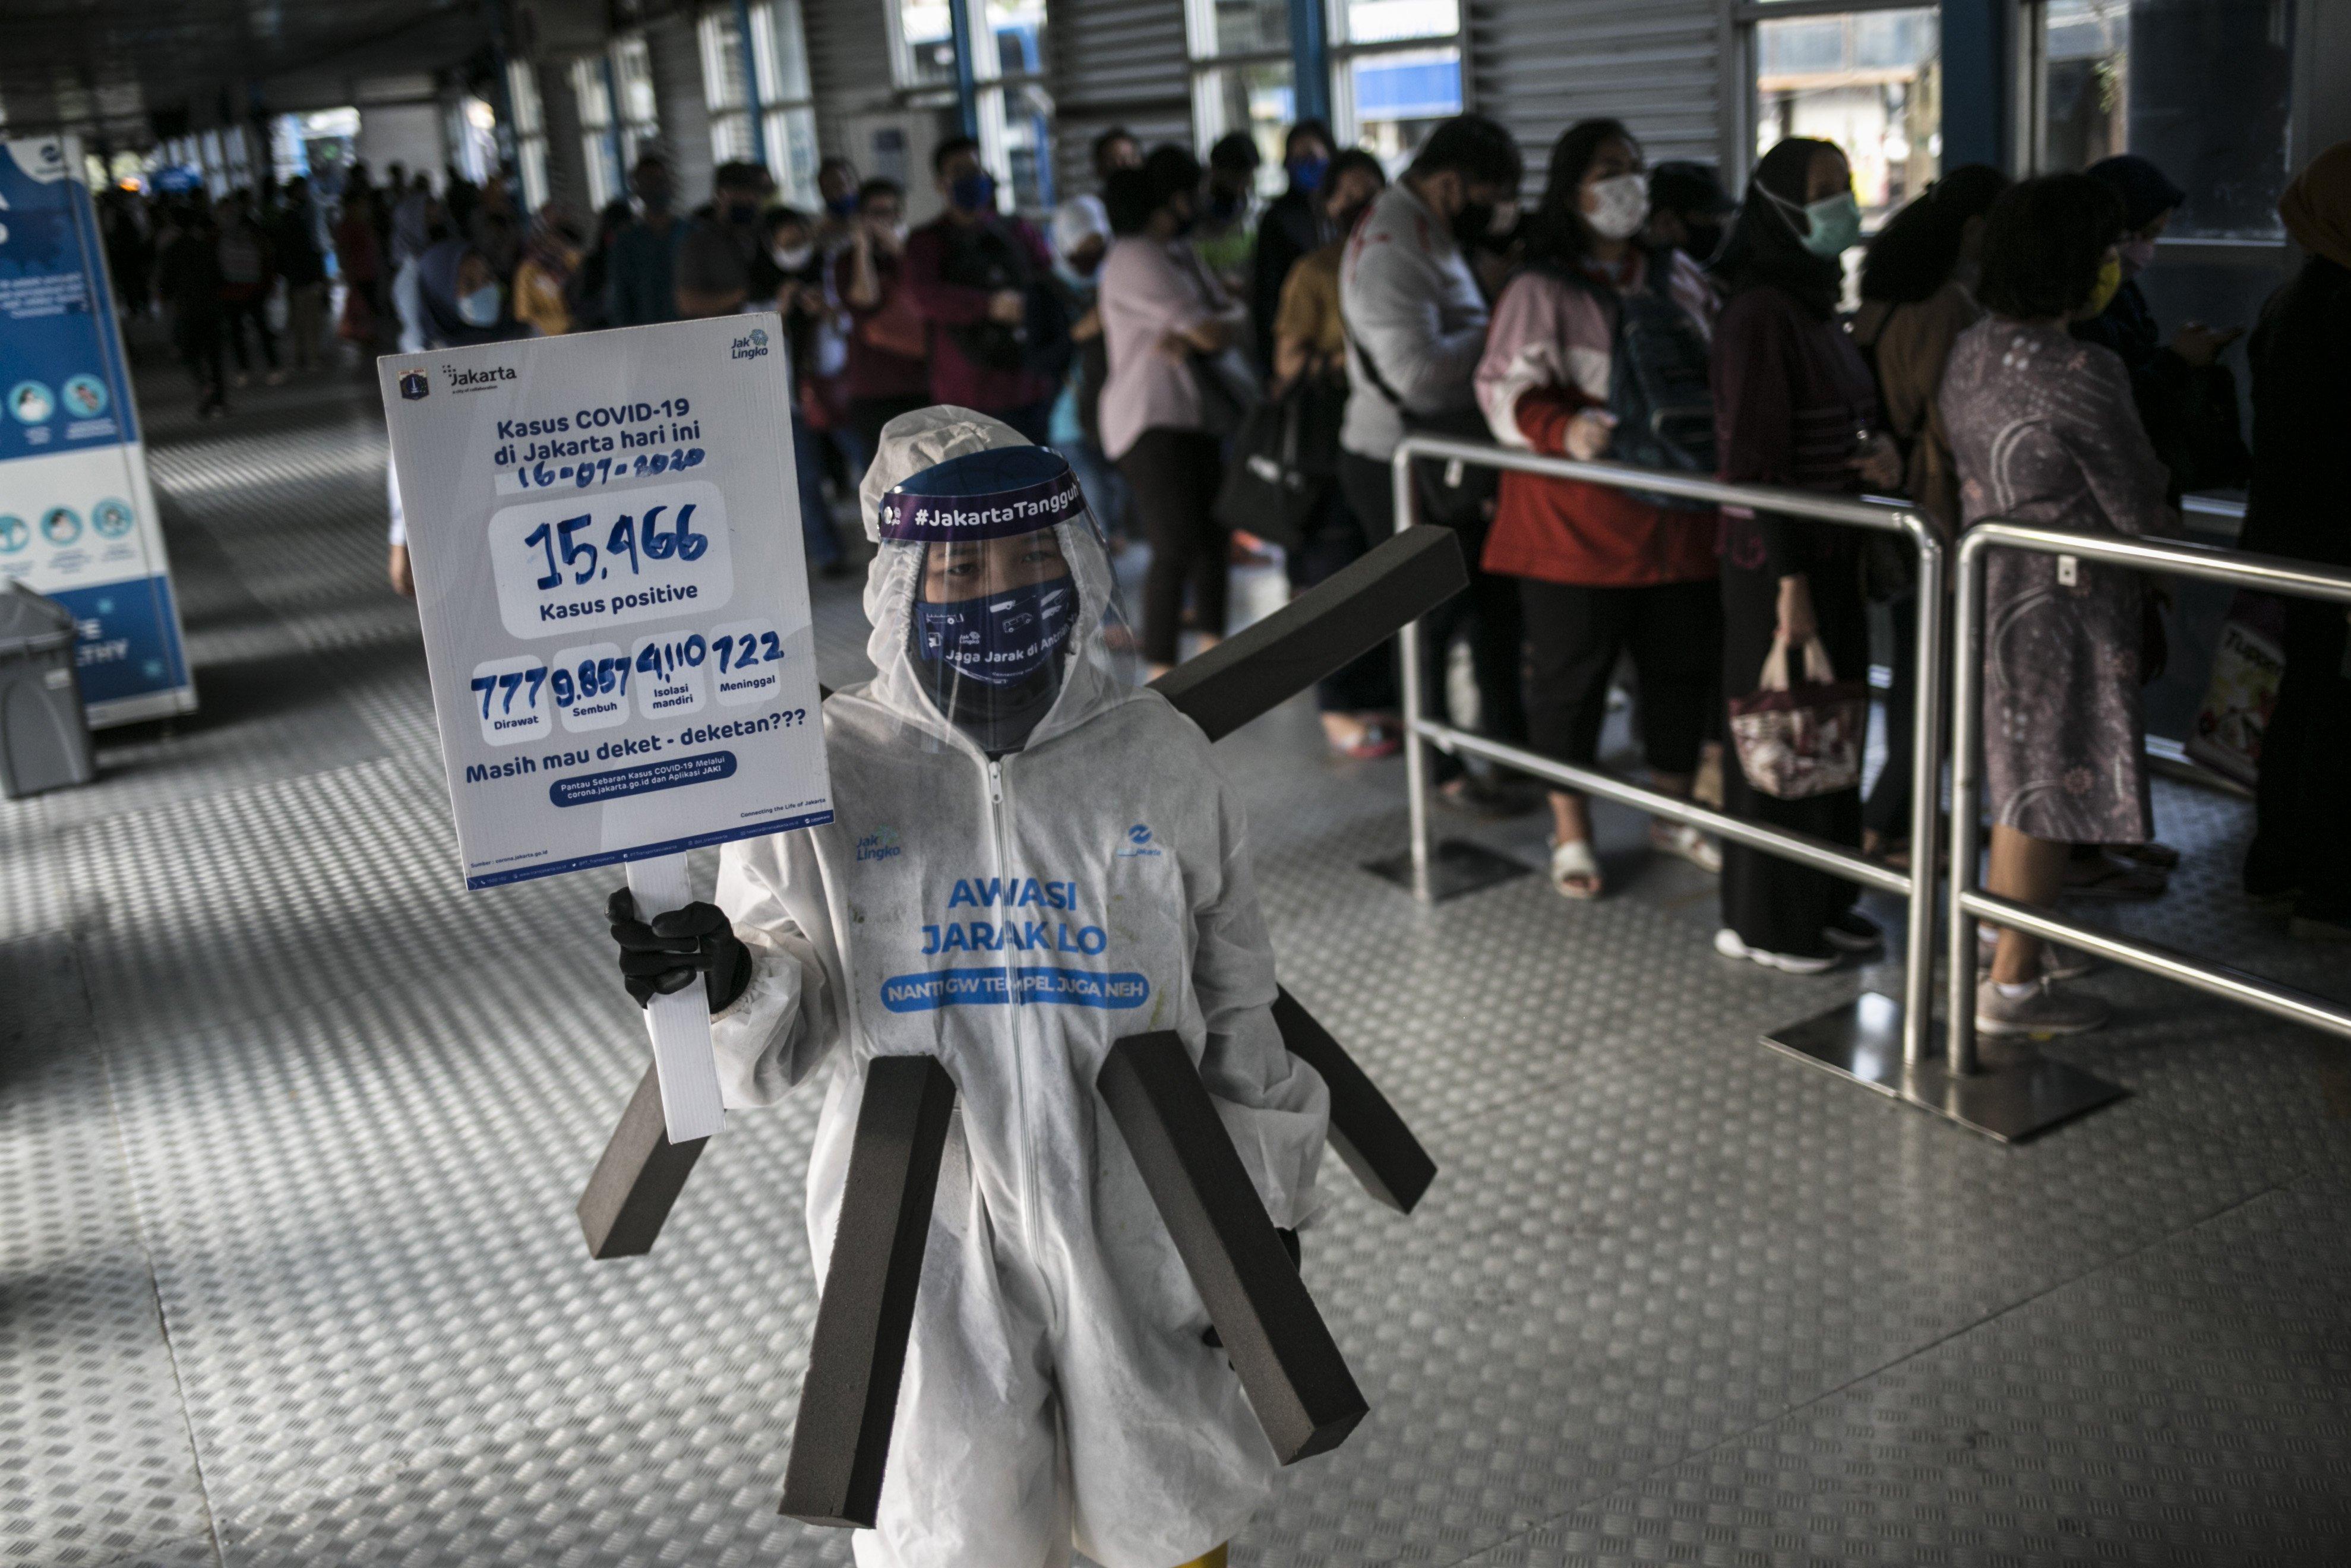 Relawan melakukan sosialisasi untuk mengingatkan penumpang Transjakarta agar selalu menaati protokol kesehatan saat menggunakan transportasi publik guna mengantisipasi penyebaran COVID-19.